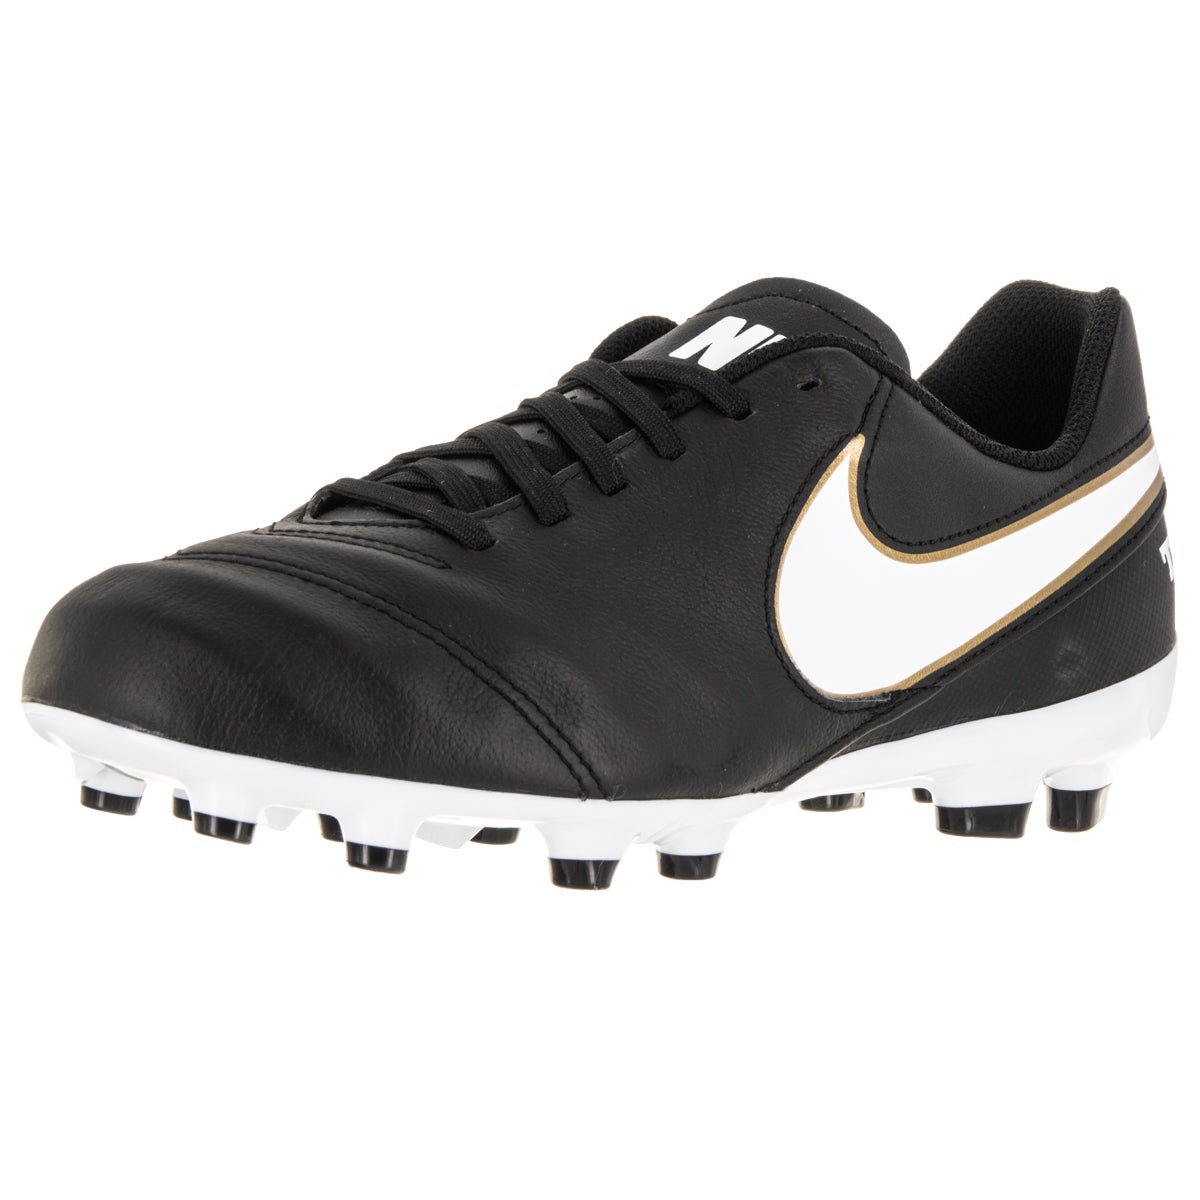 54bcd44e5e34 Shop Nike Kid's Jr Tiempo Legend Vi Fg Black/White/Metallic Gold Soccer  Cleat - Free Shipping Today - Overstock - 12324110